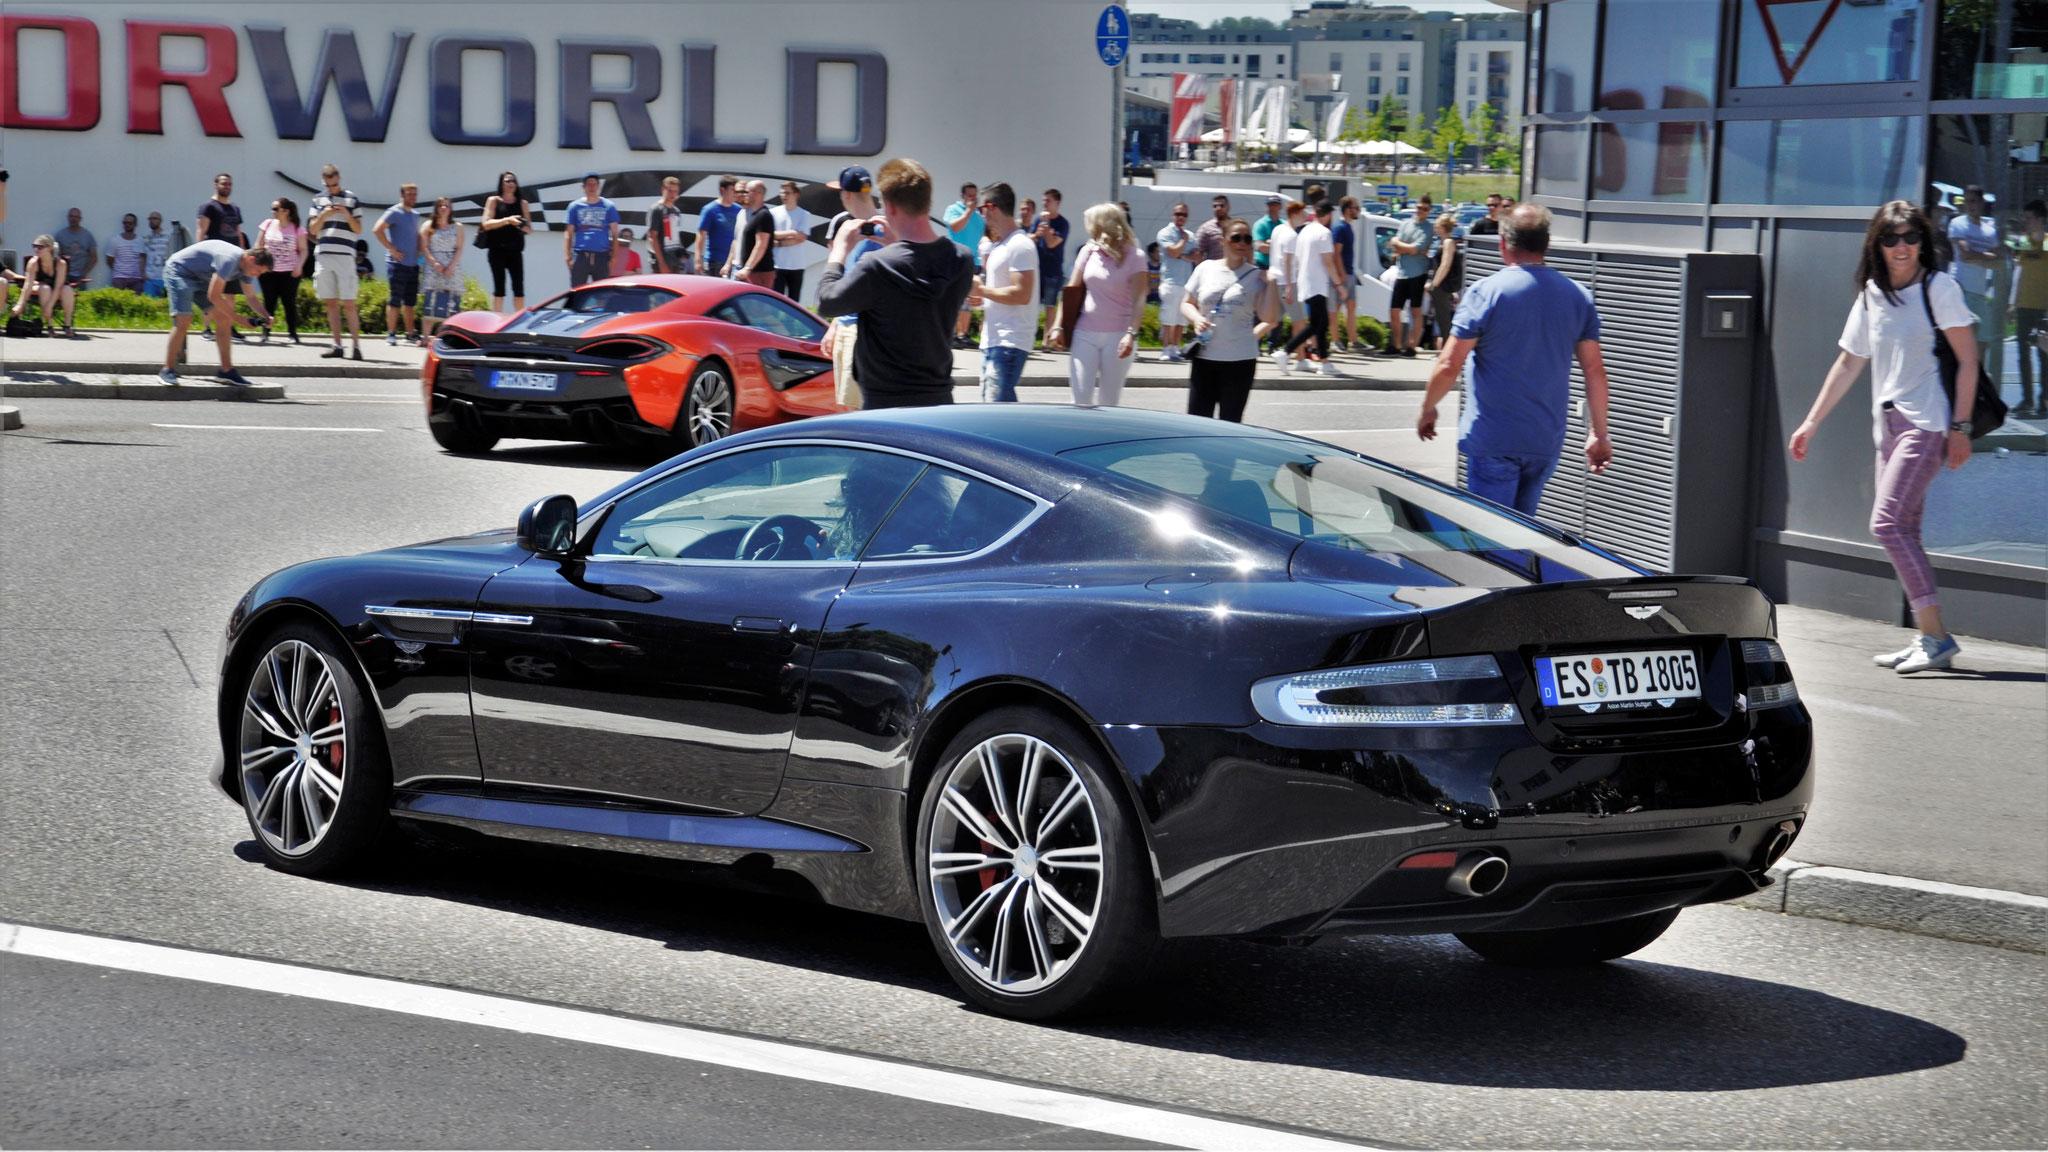 Aston Martin DB9 GT Coupé - ES-TB-1805